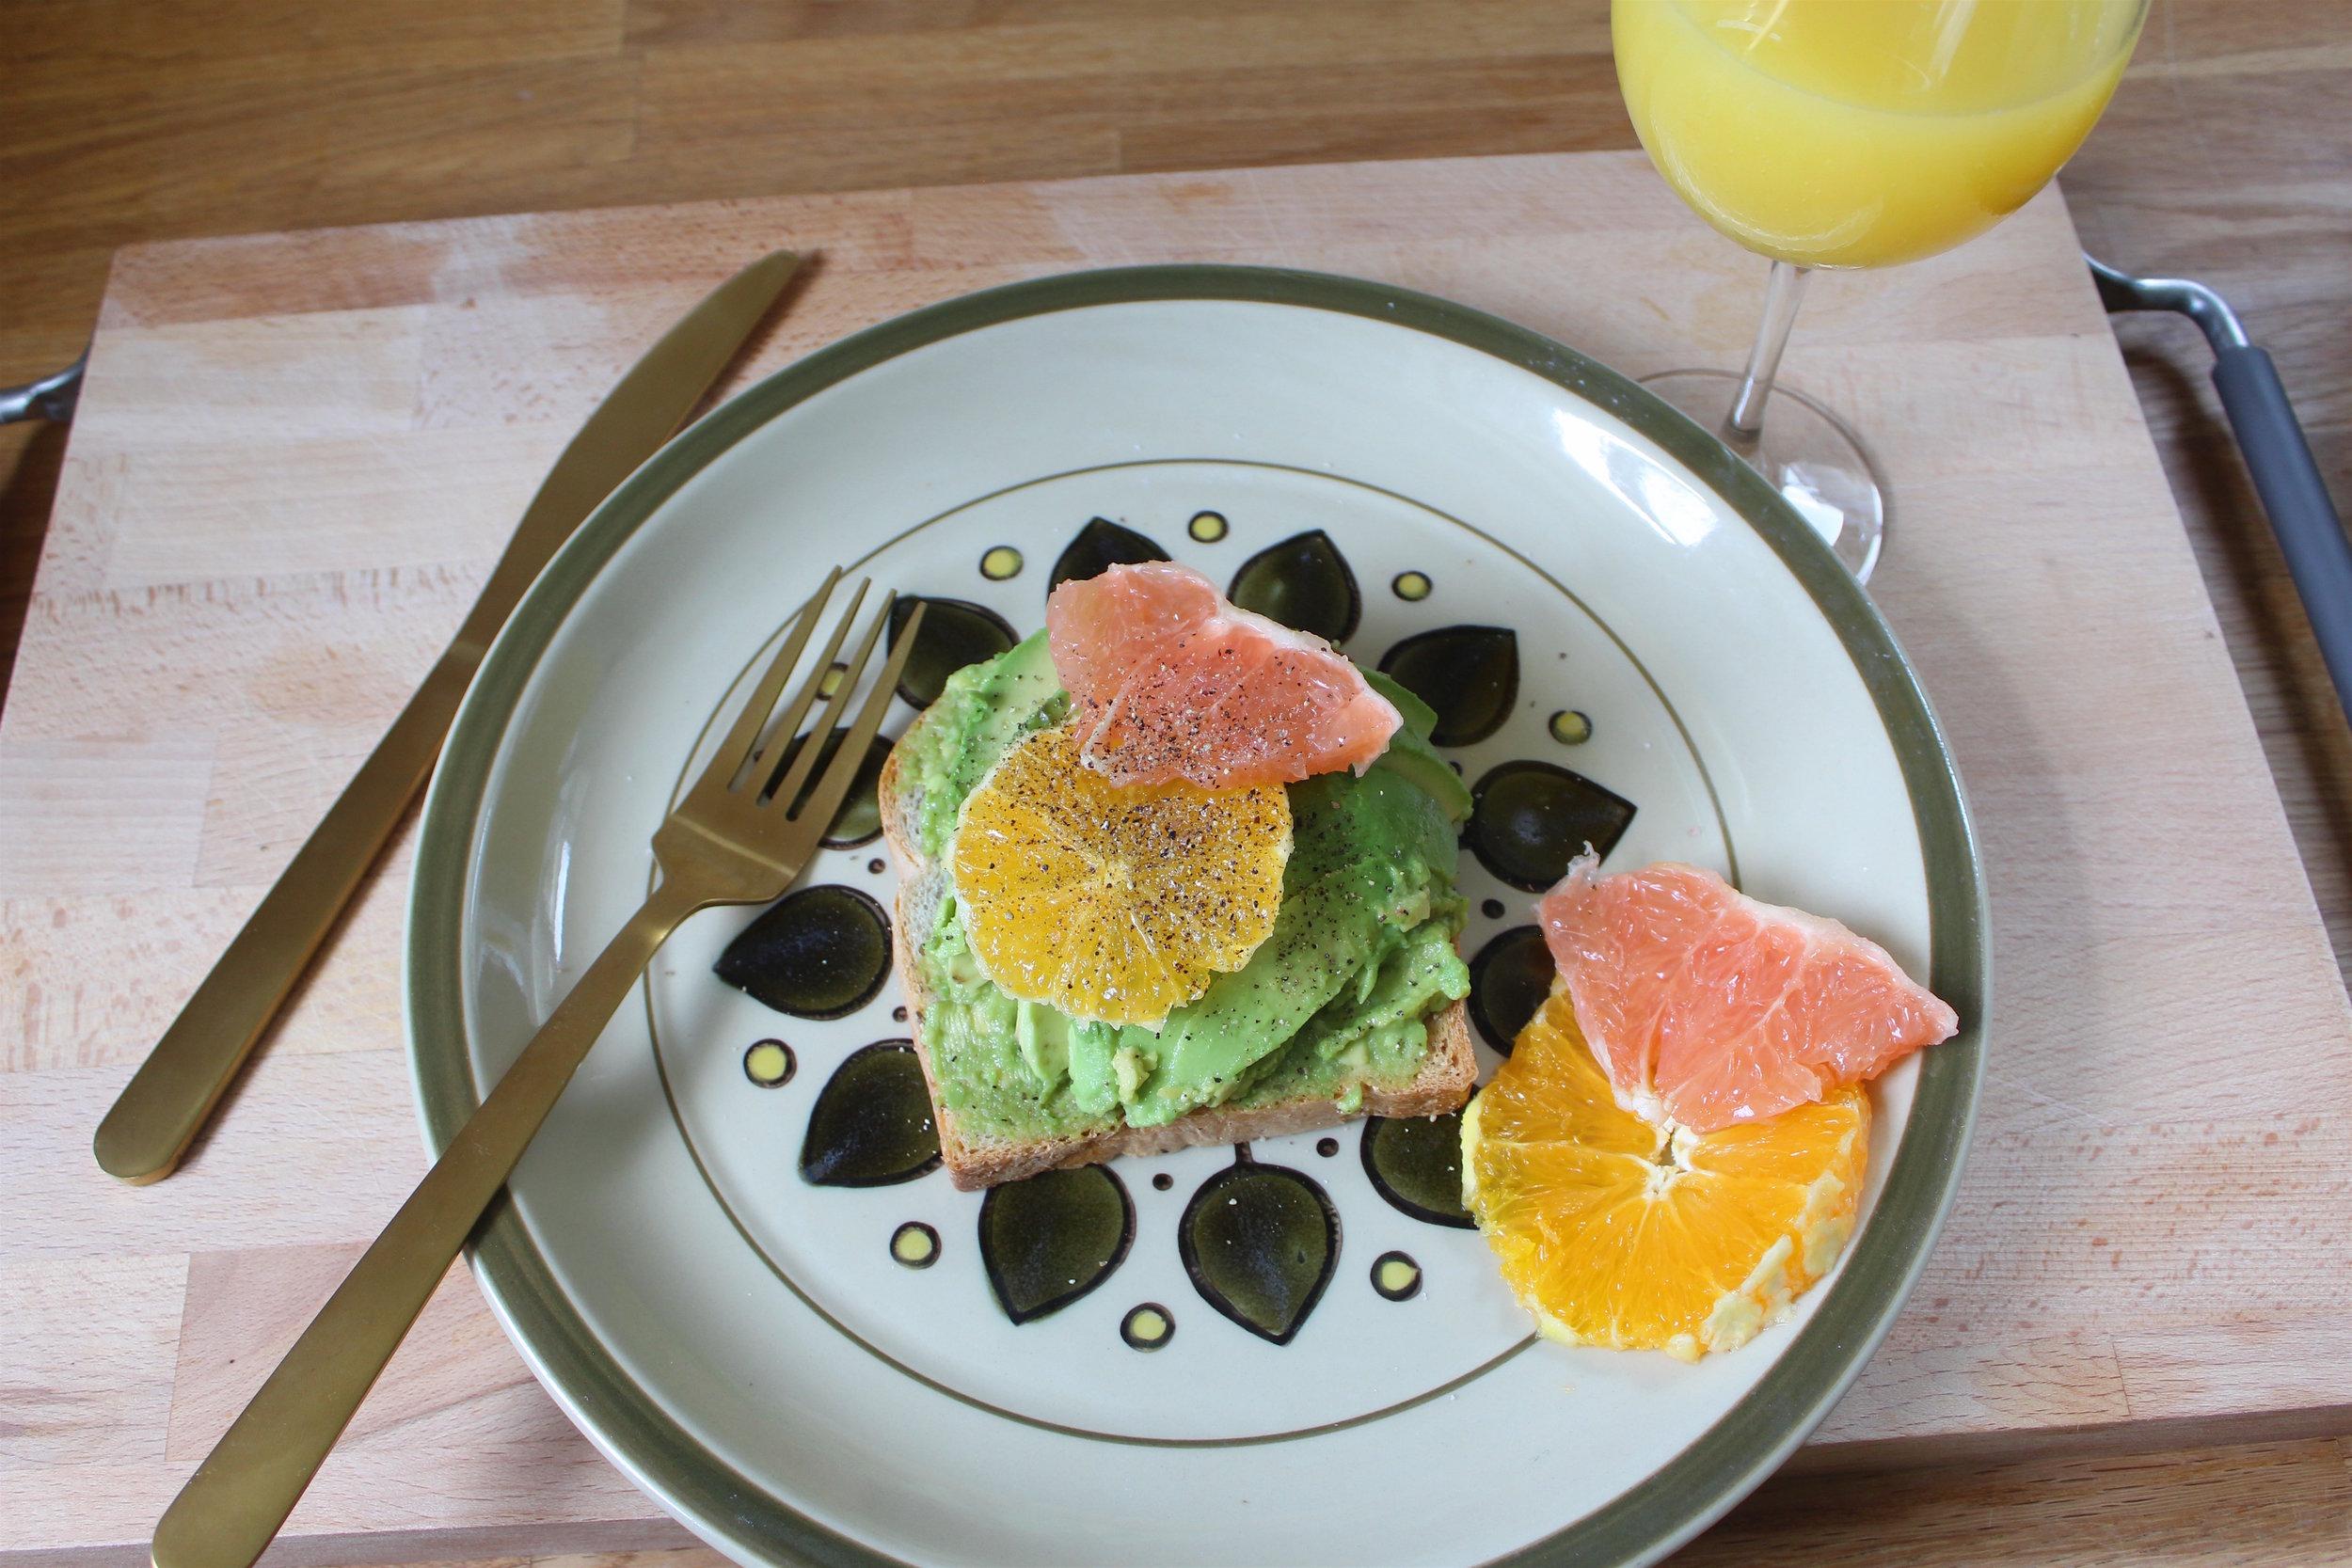 Babe Crafted_Rollin Oats_Brunch Recipe_Citrus Avocado Toast_9.jpg